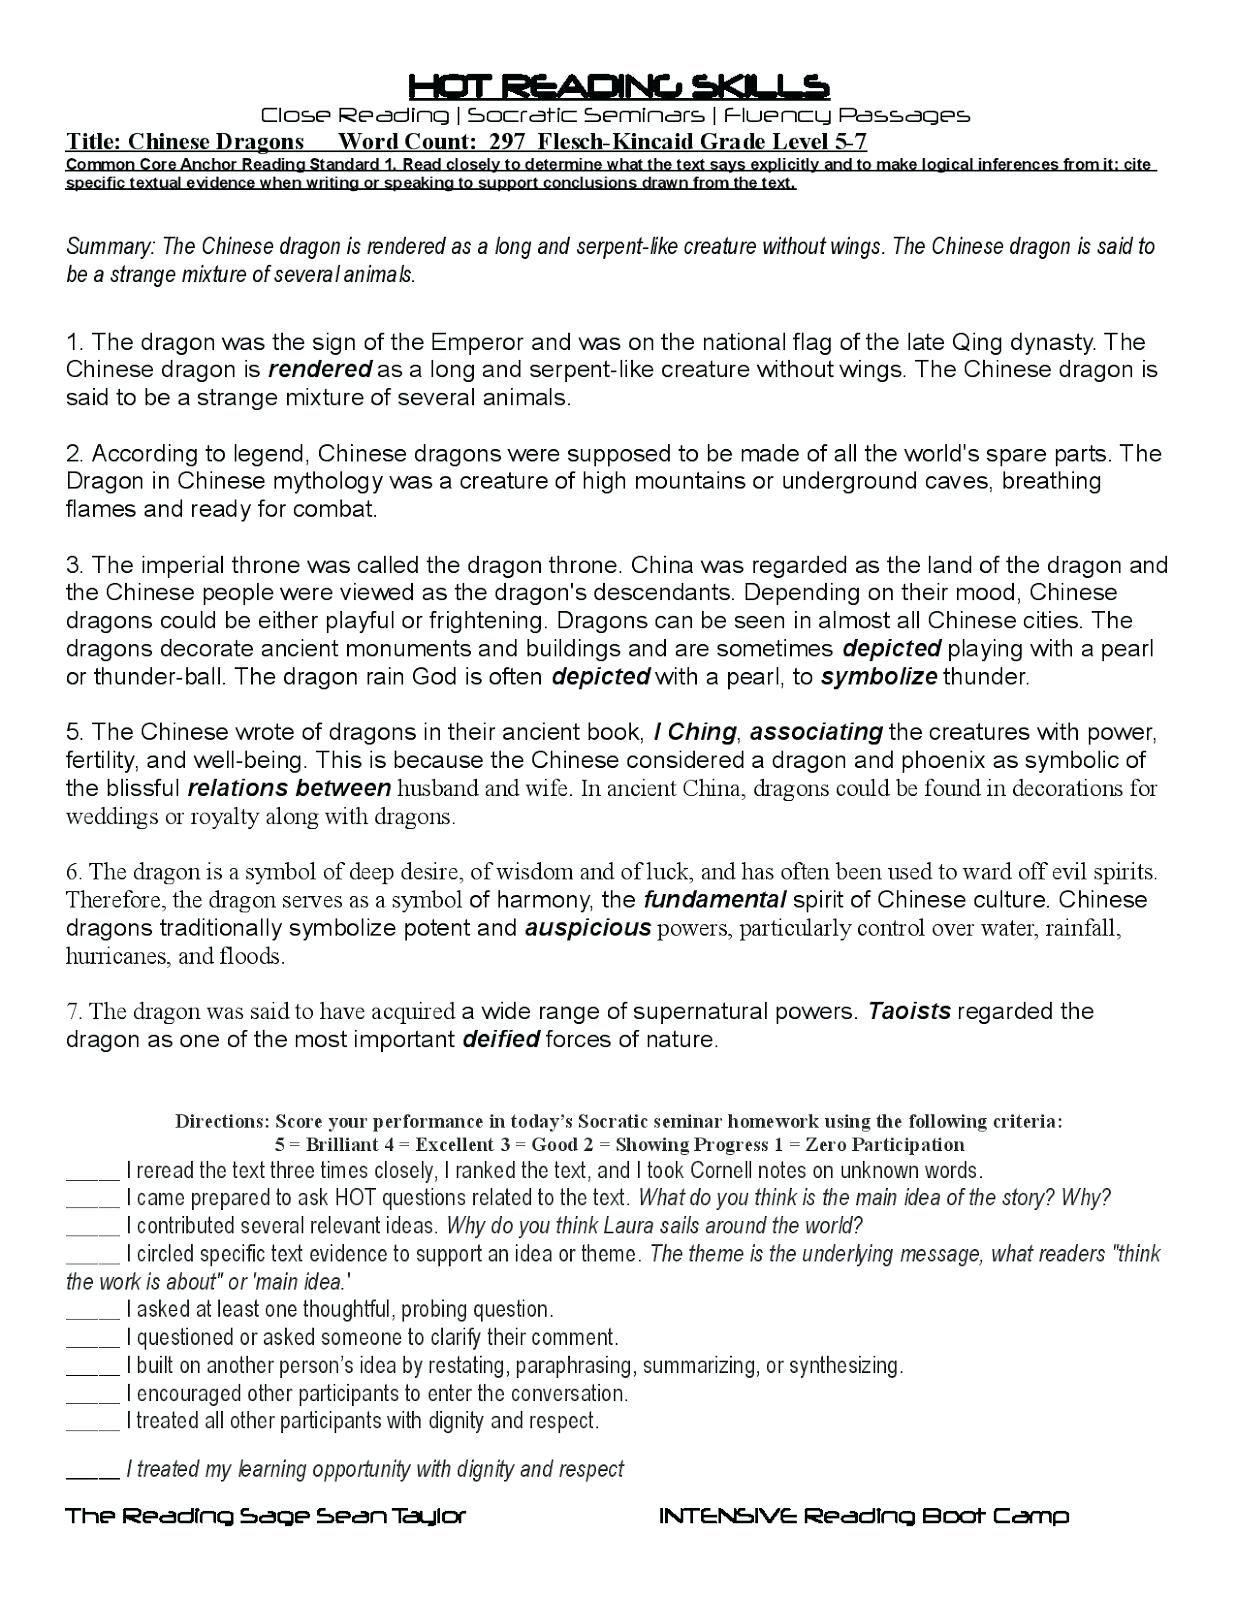 Theme Vs Main Idea Worksheet